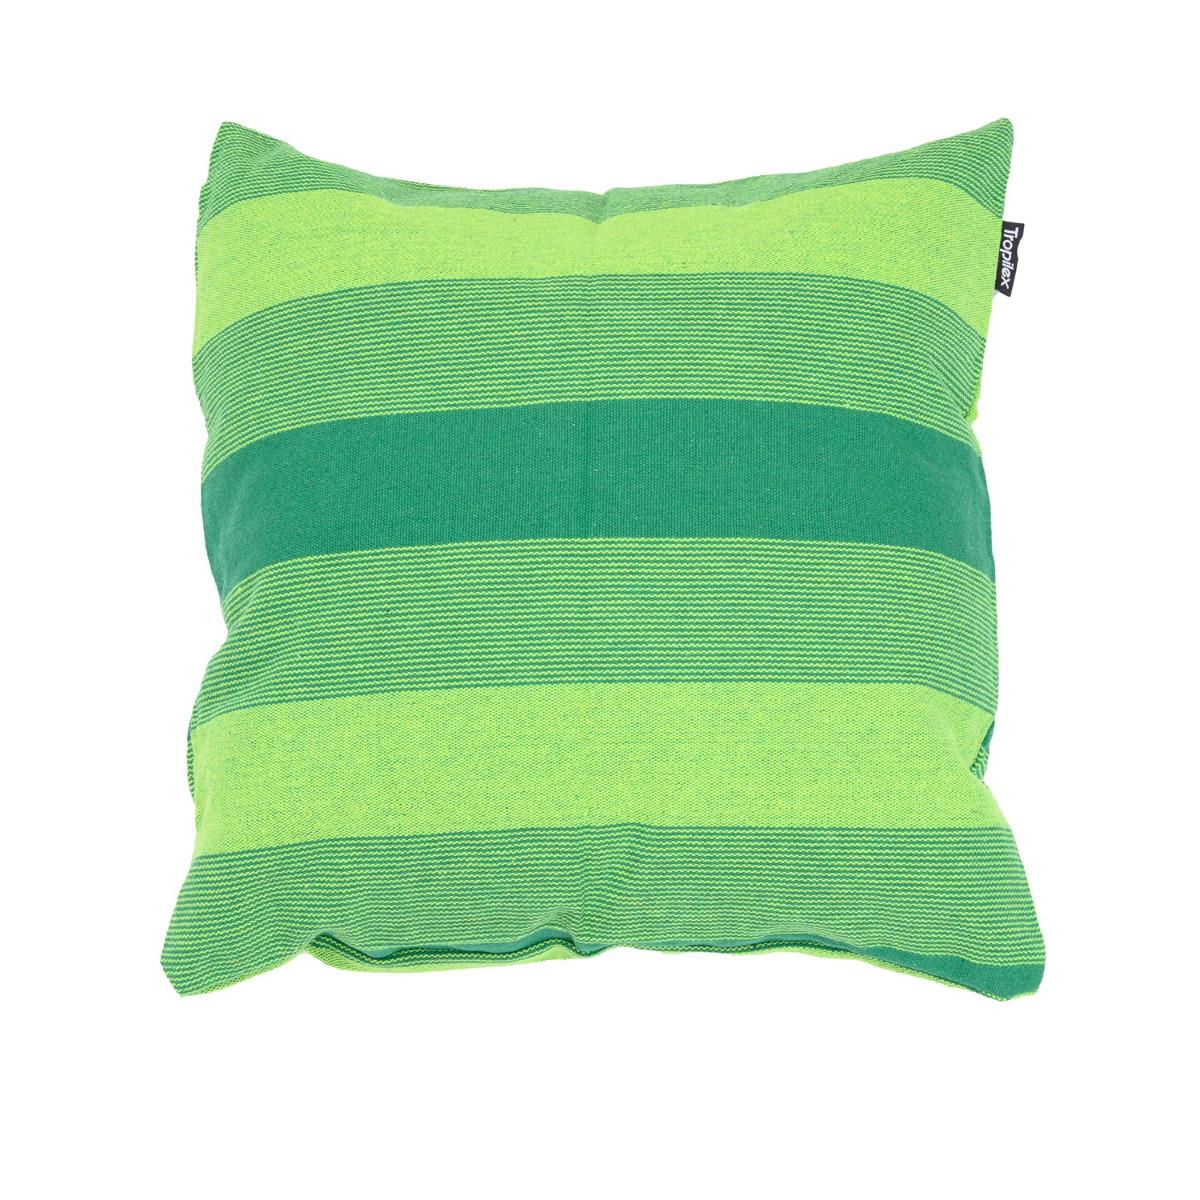 Kussen 'Dream' Green - Tropilex �